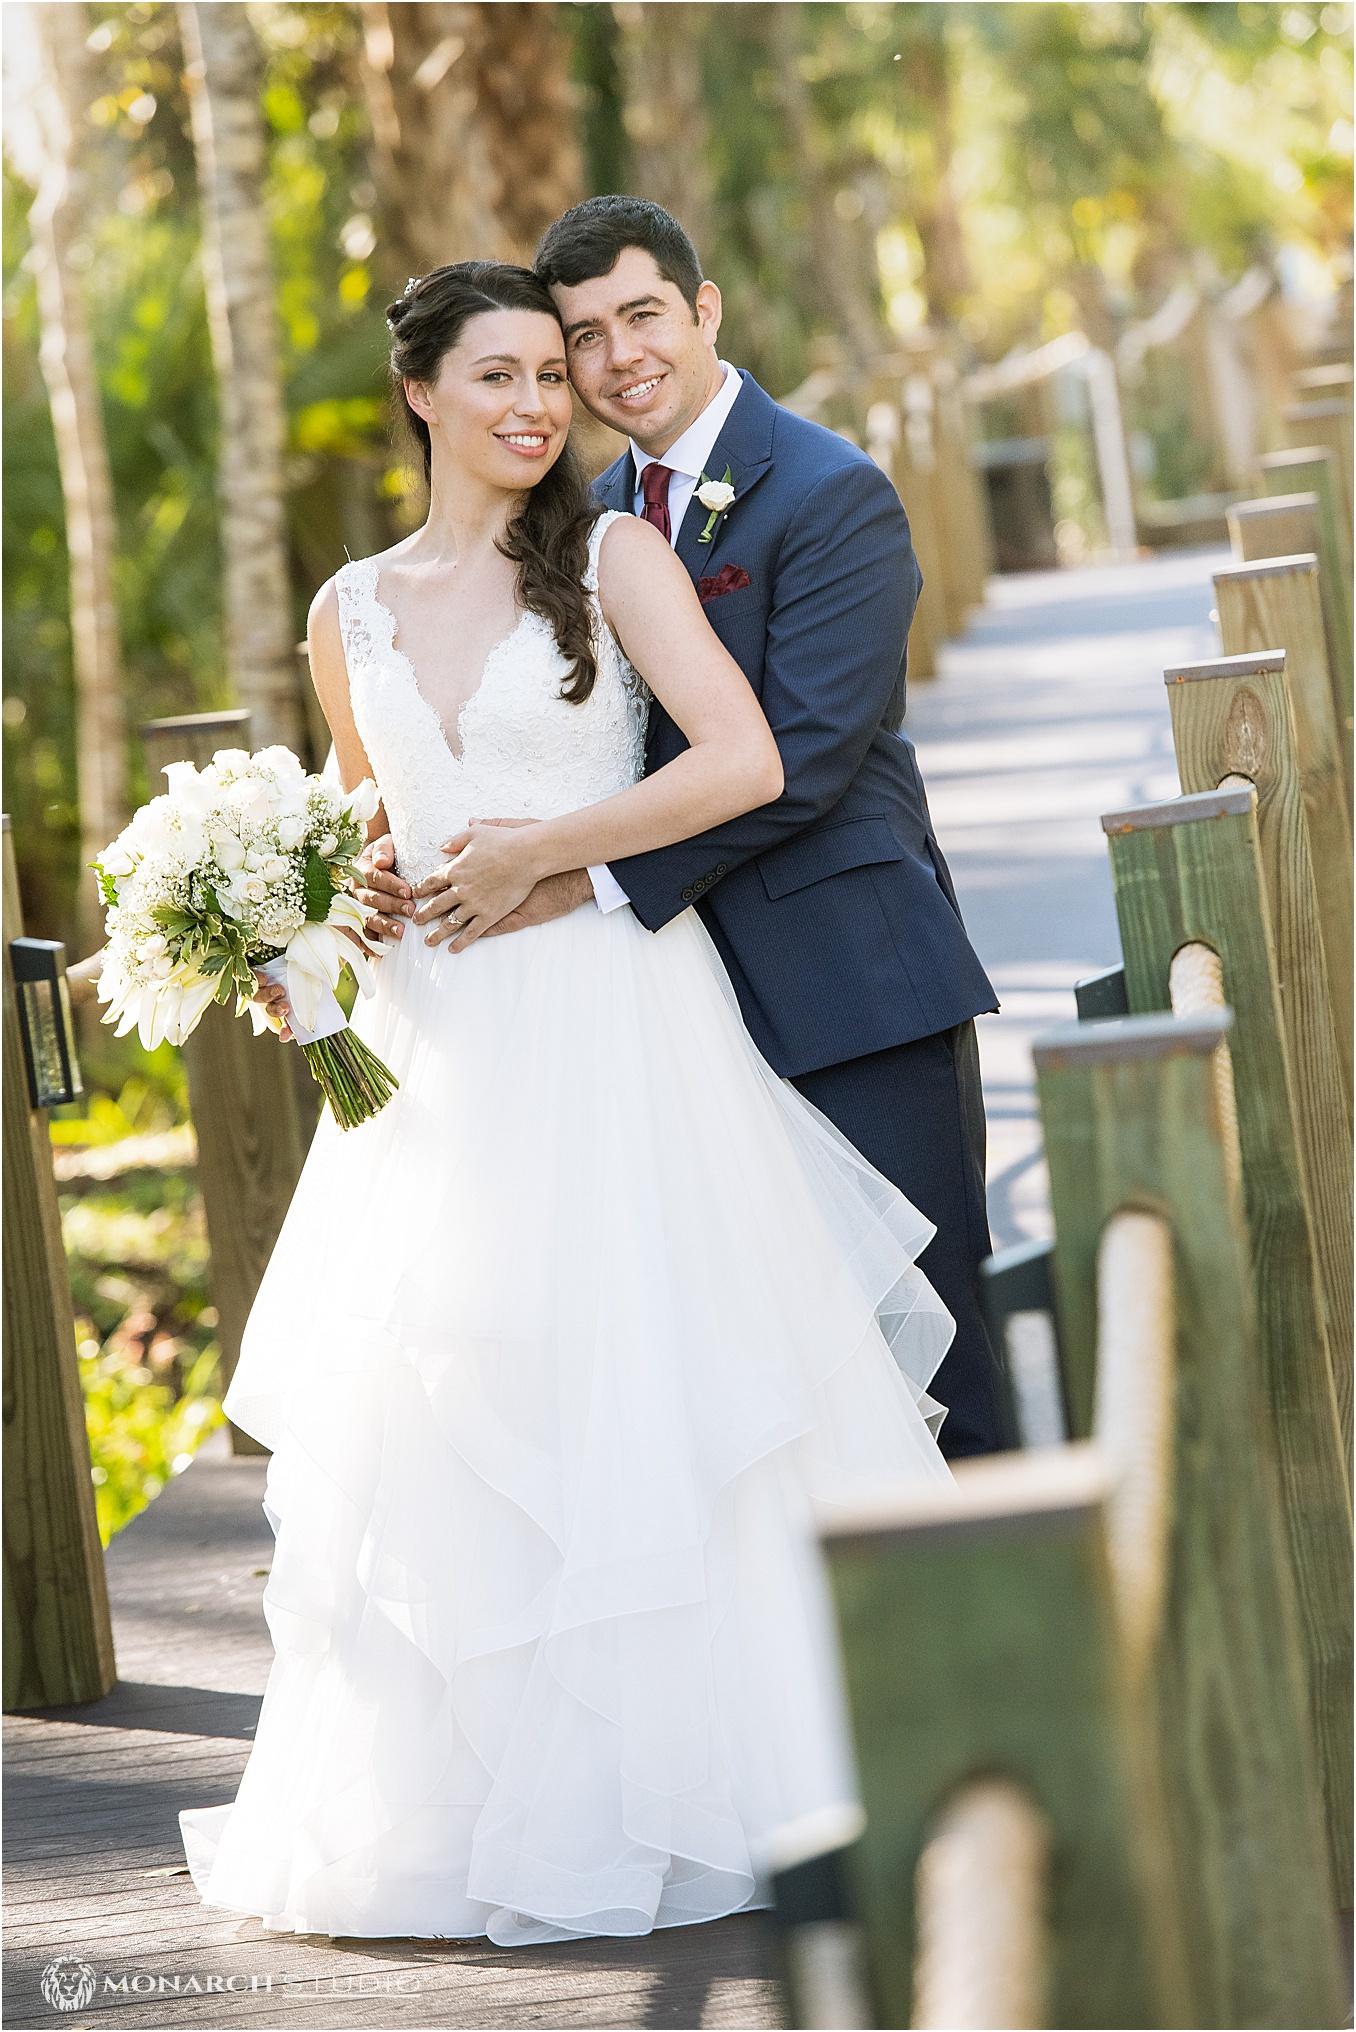 Wedding-photographer-in-sanford-florida-natural-wedding-017.jpg